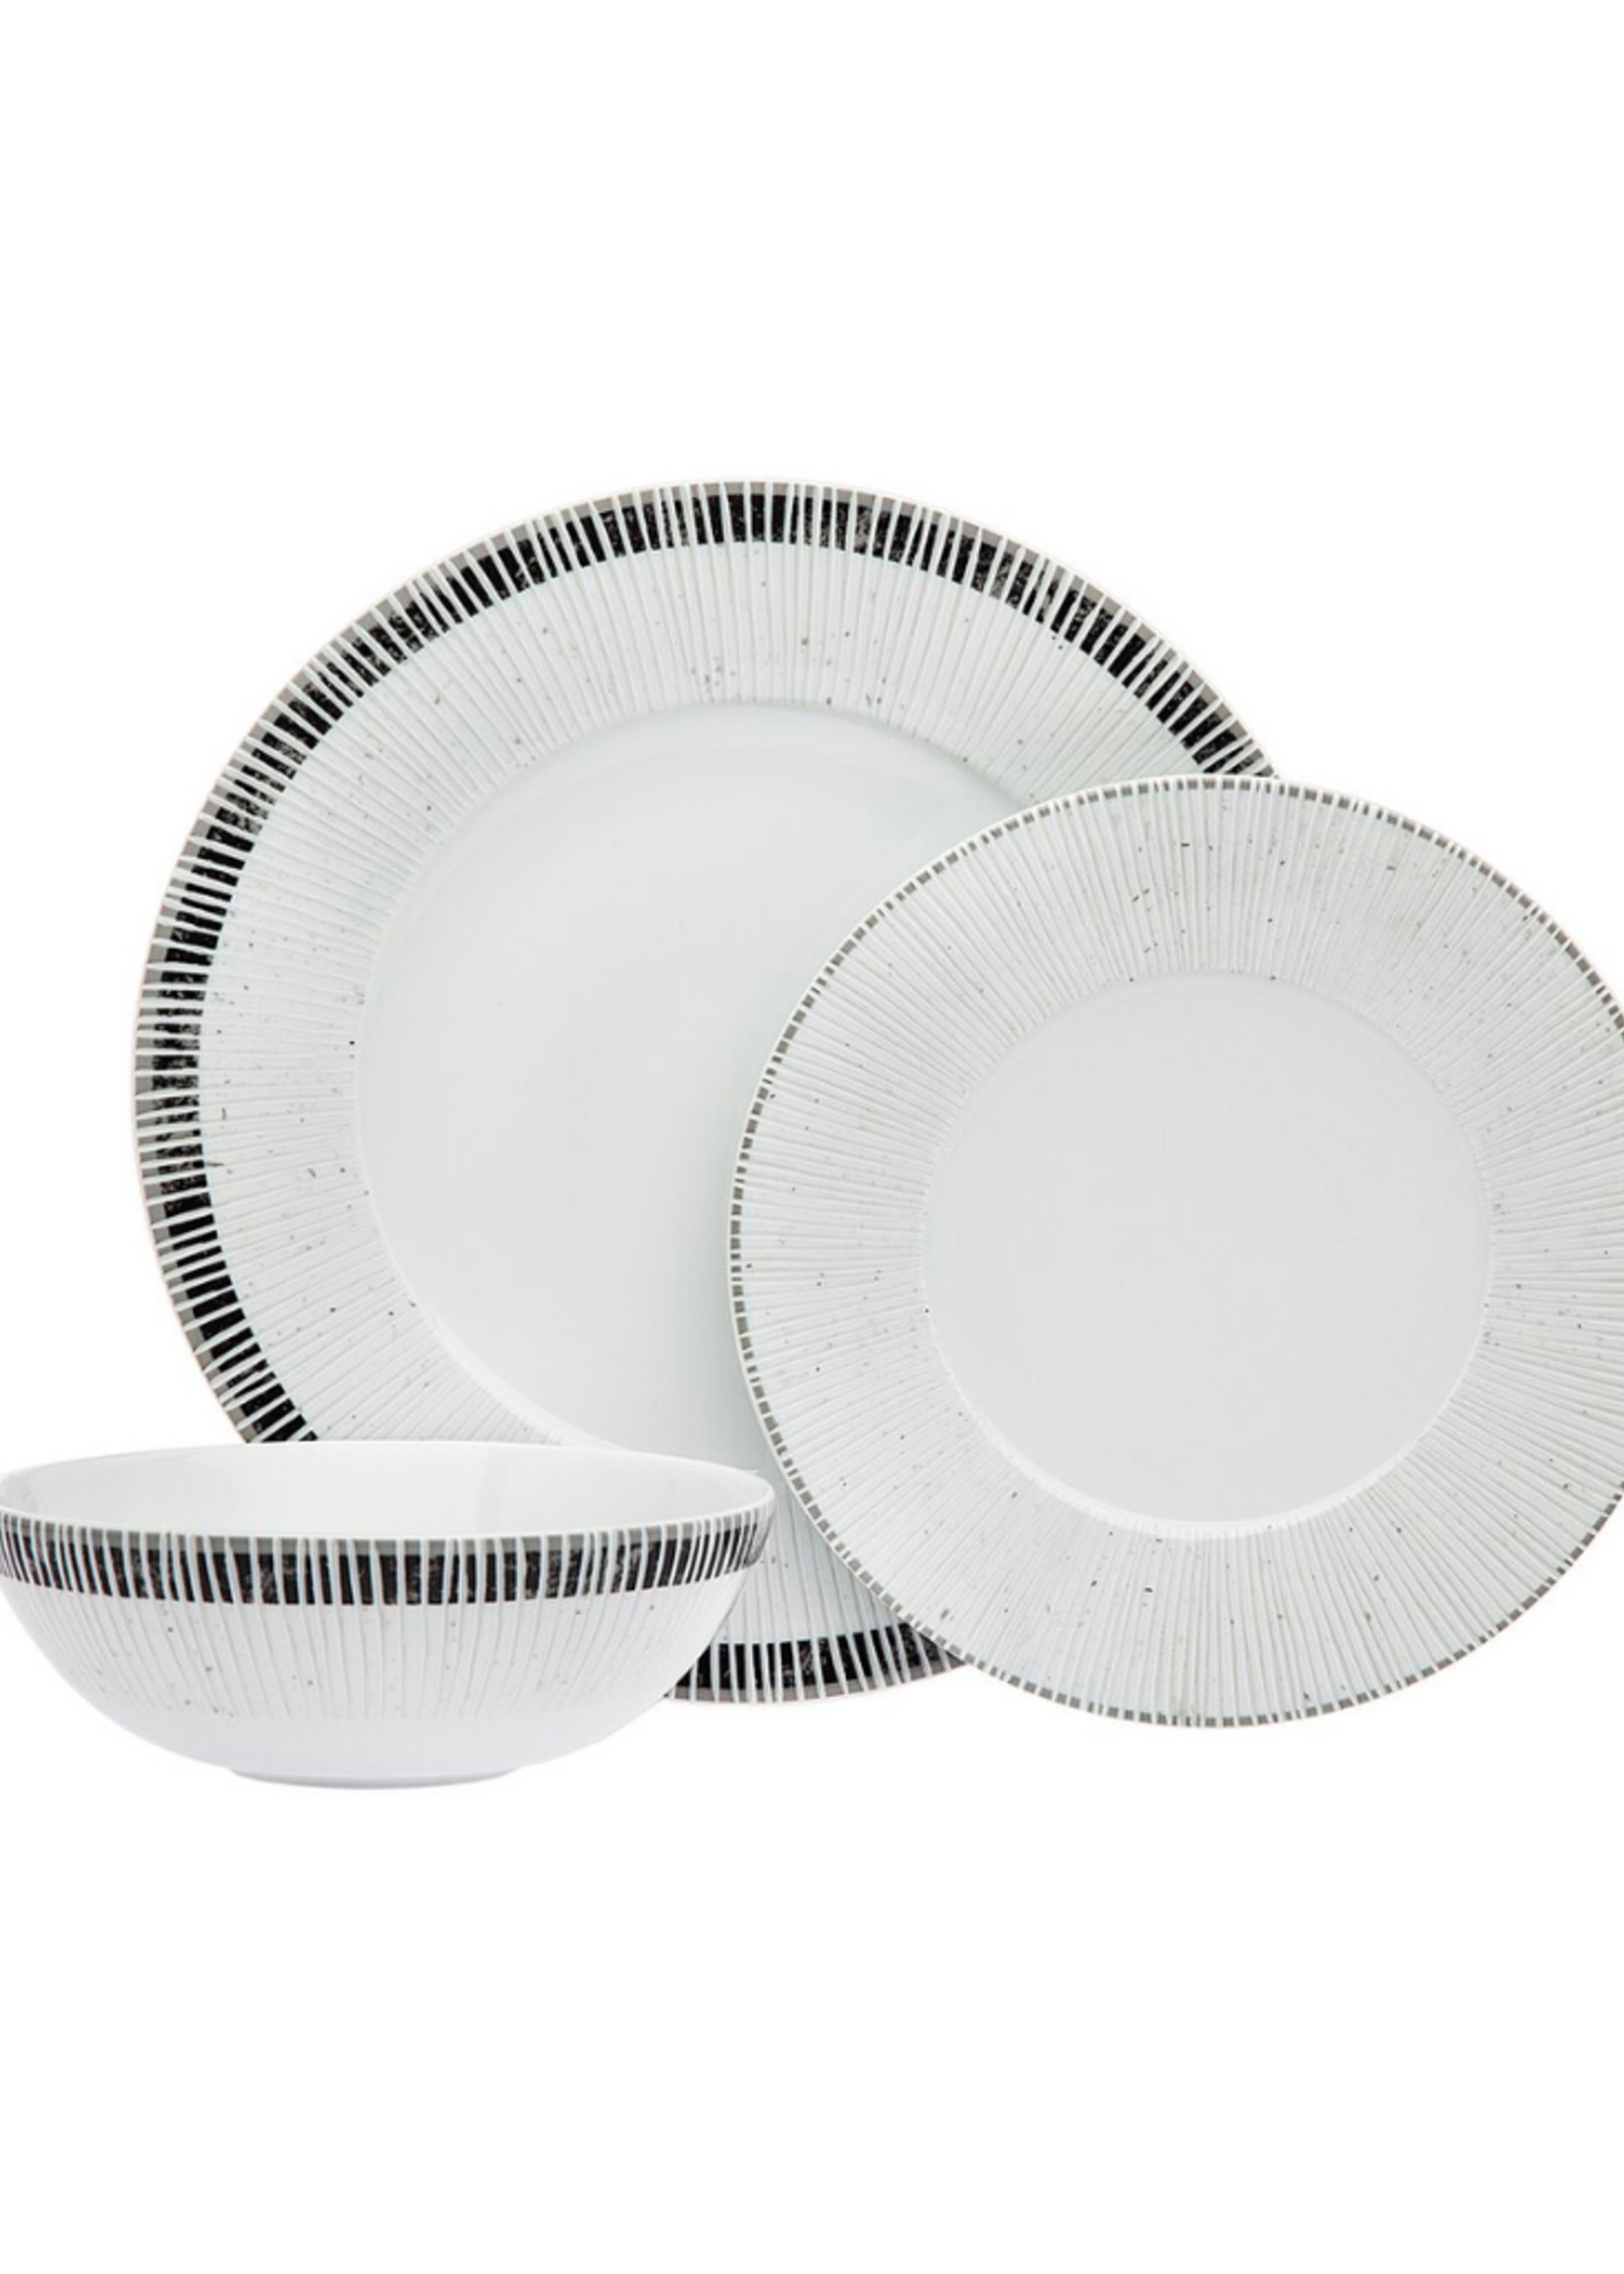 Zebra 3 Piece Dinnerware Setting